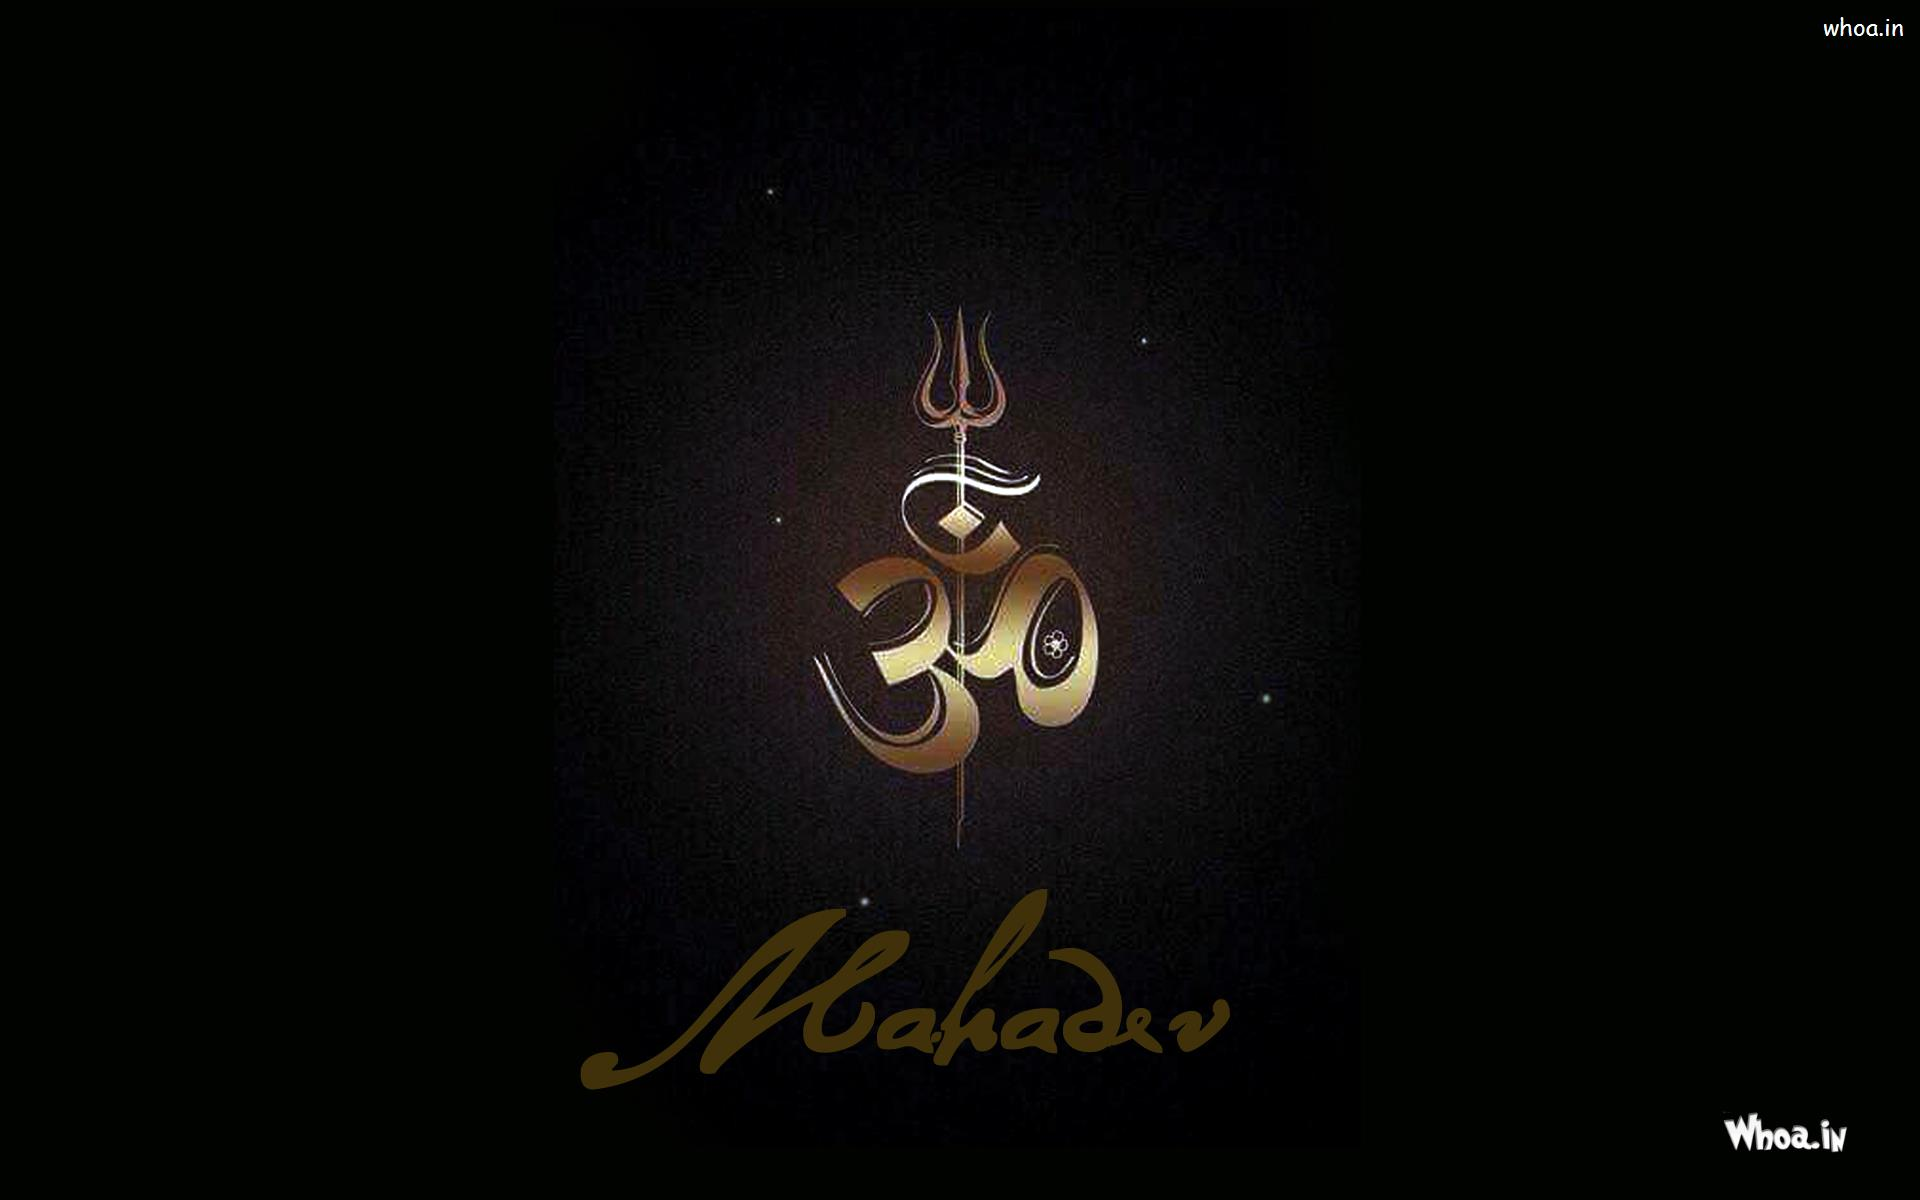 Hd wallpaper mahadev Om pic download